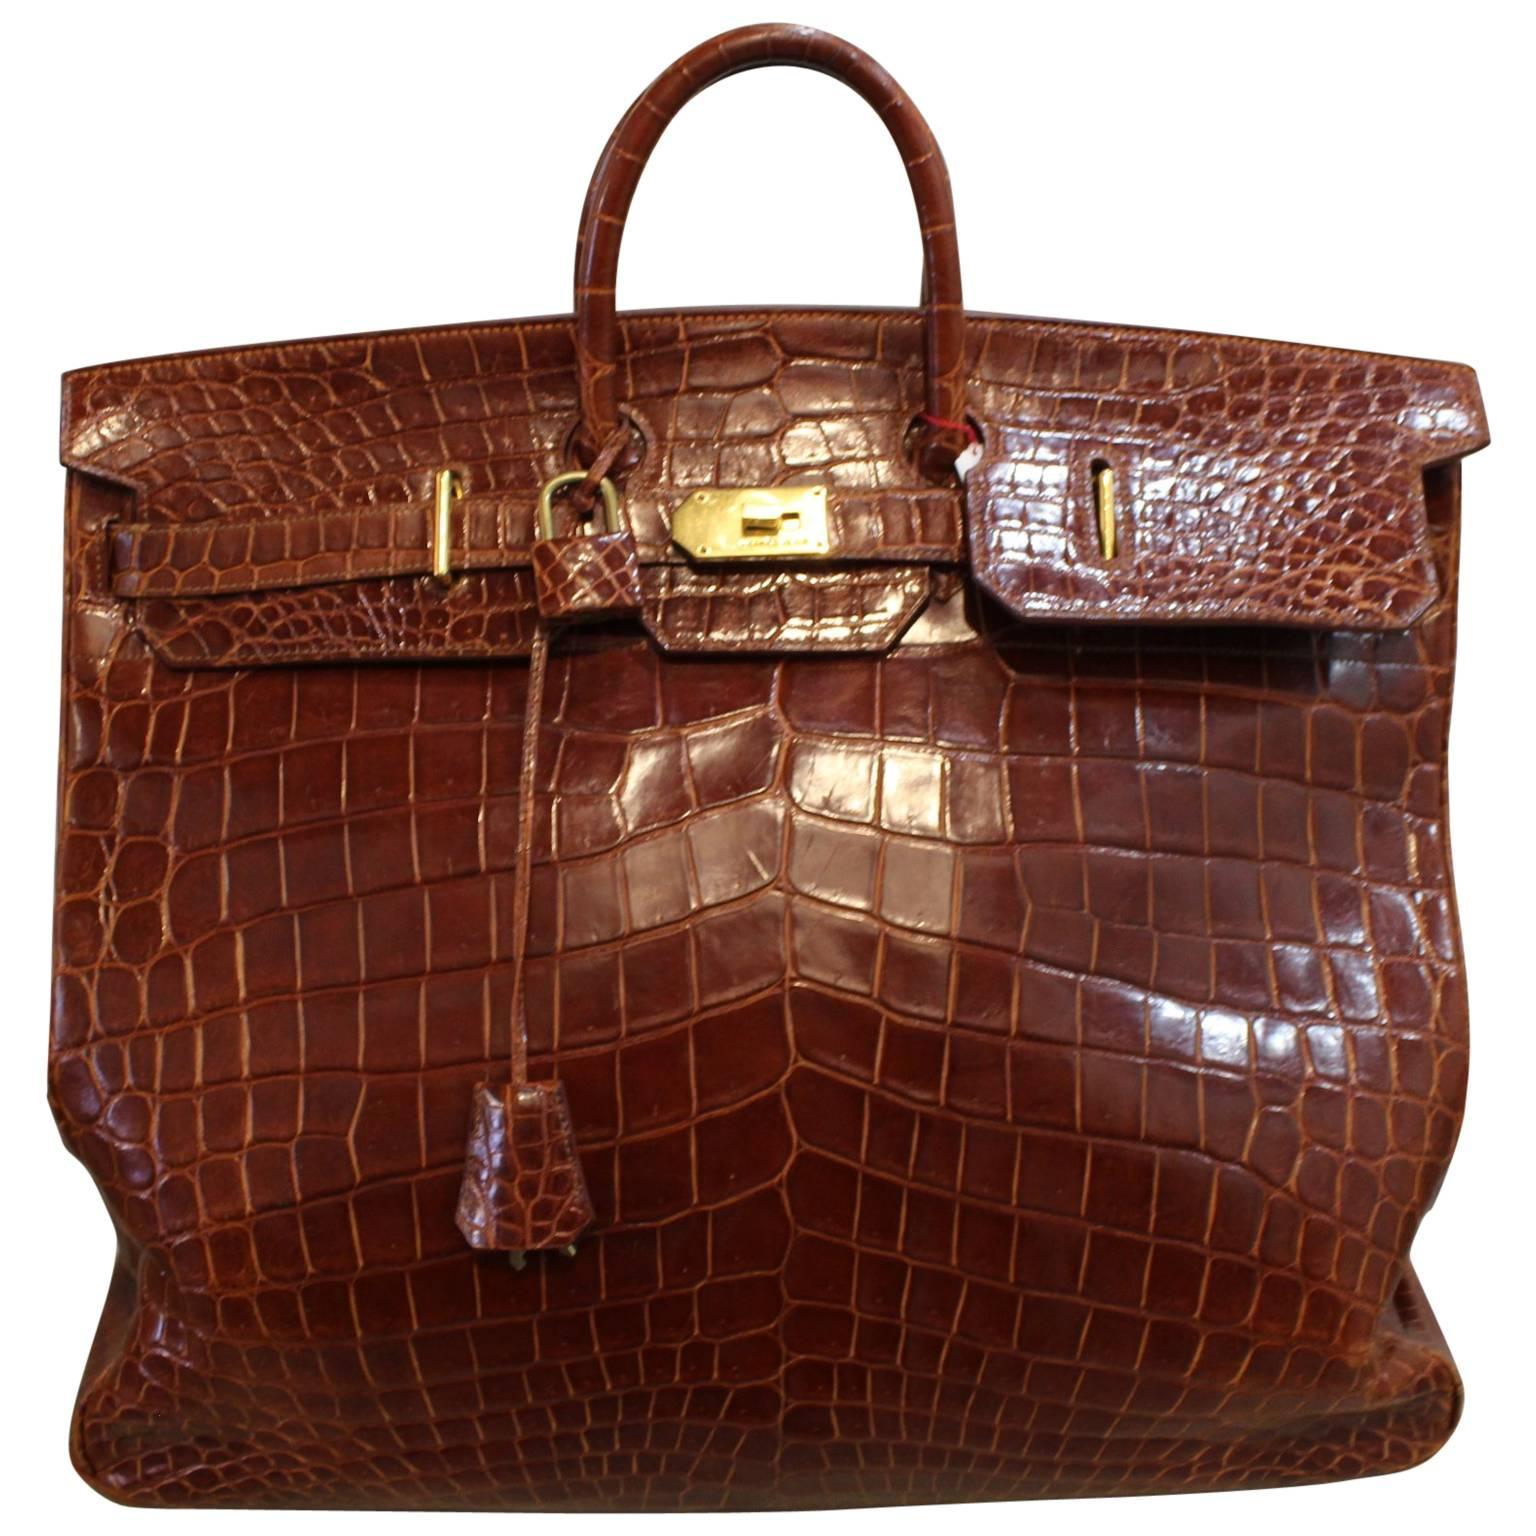 1993 Hermes Travel XXL Birkin Bag / Haut à Courroies in Brown Cognac  Crocodile For Sale